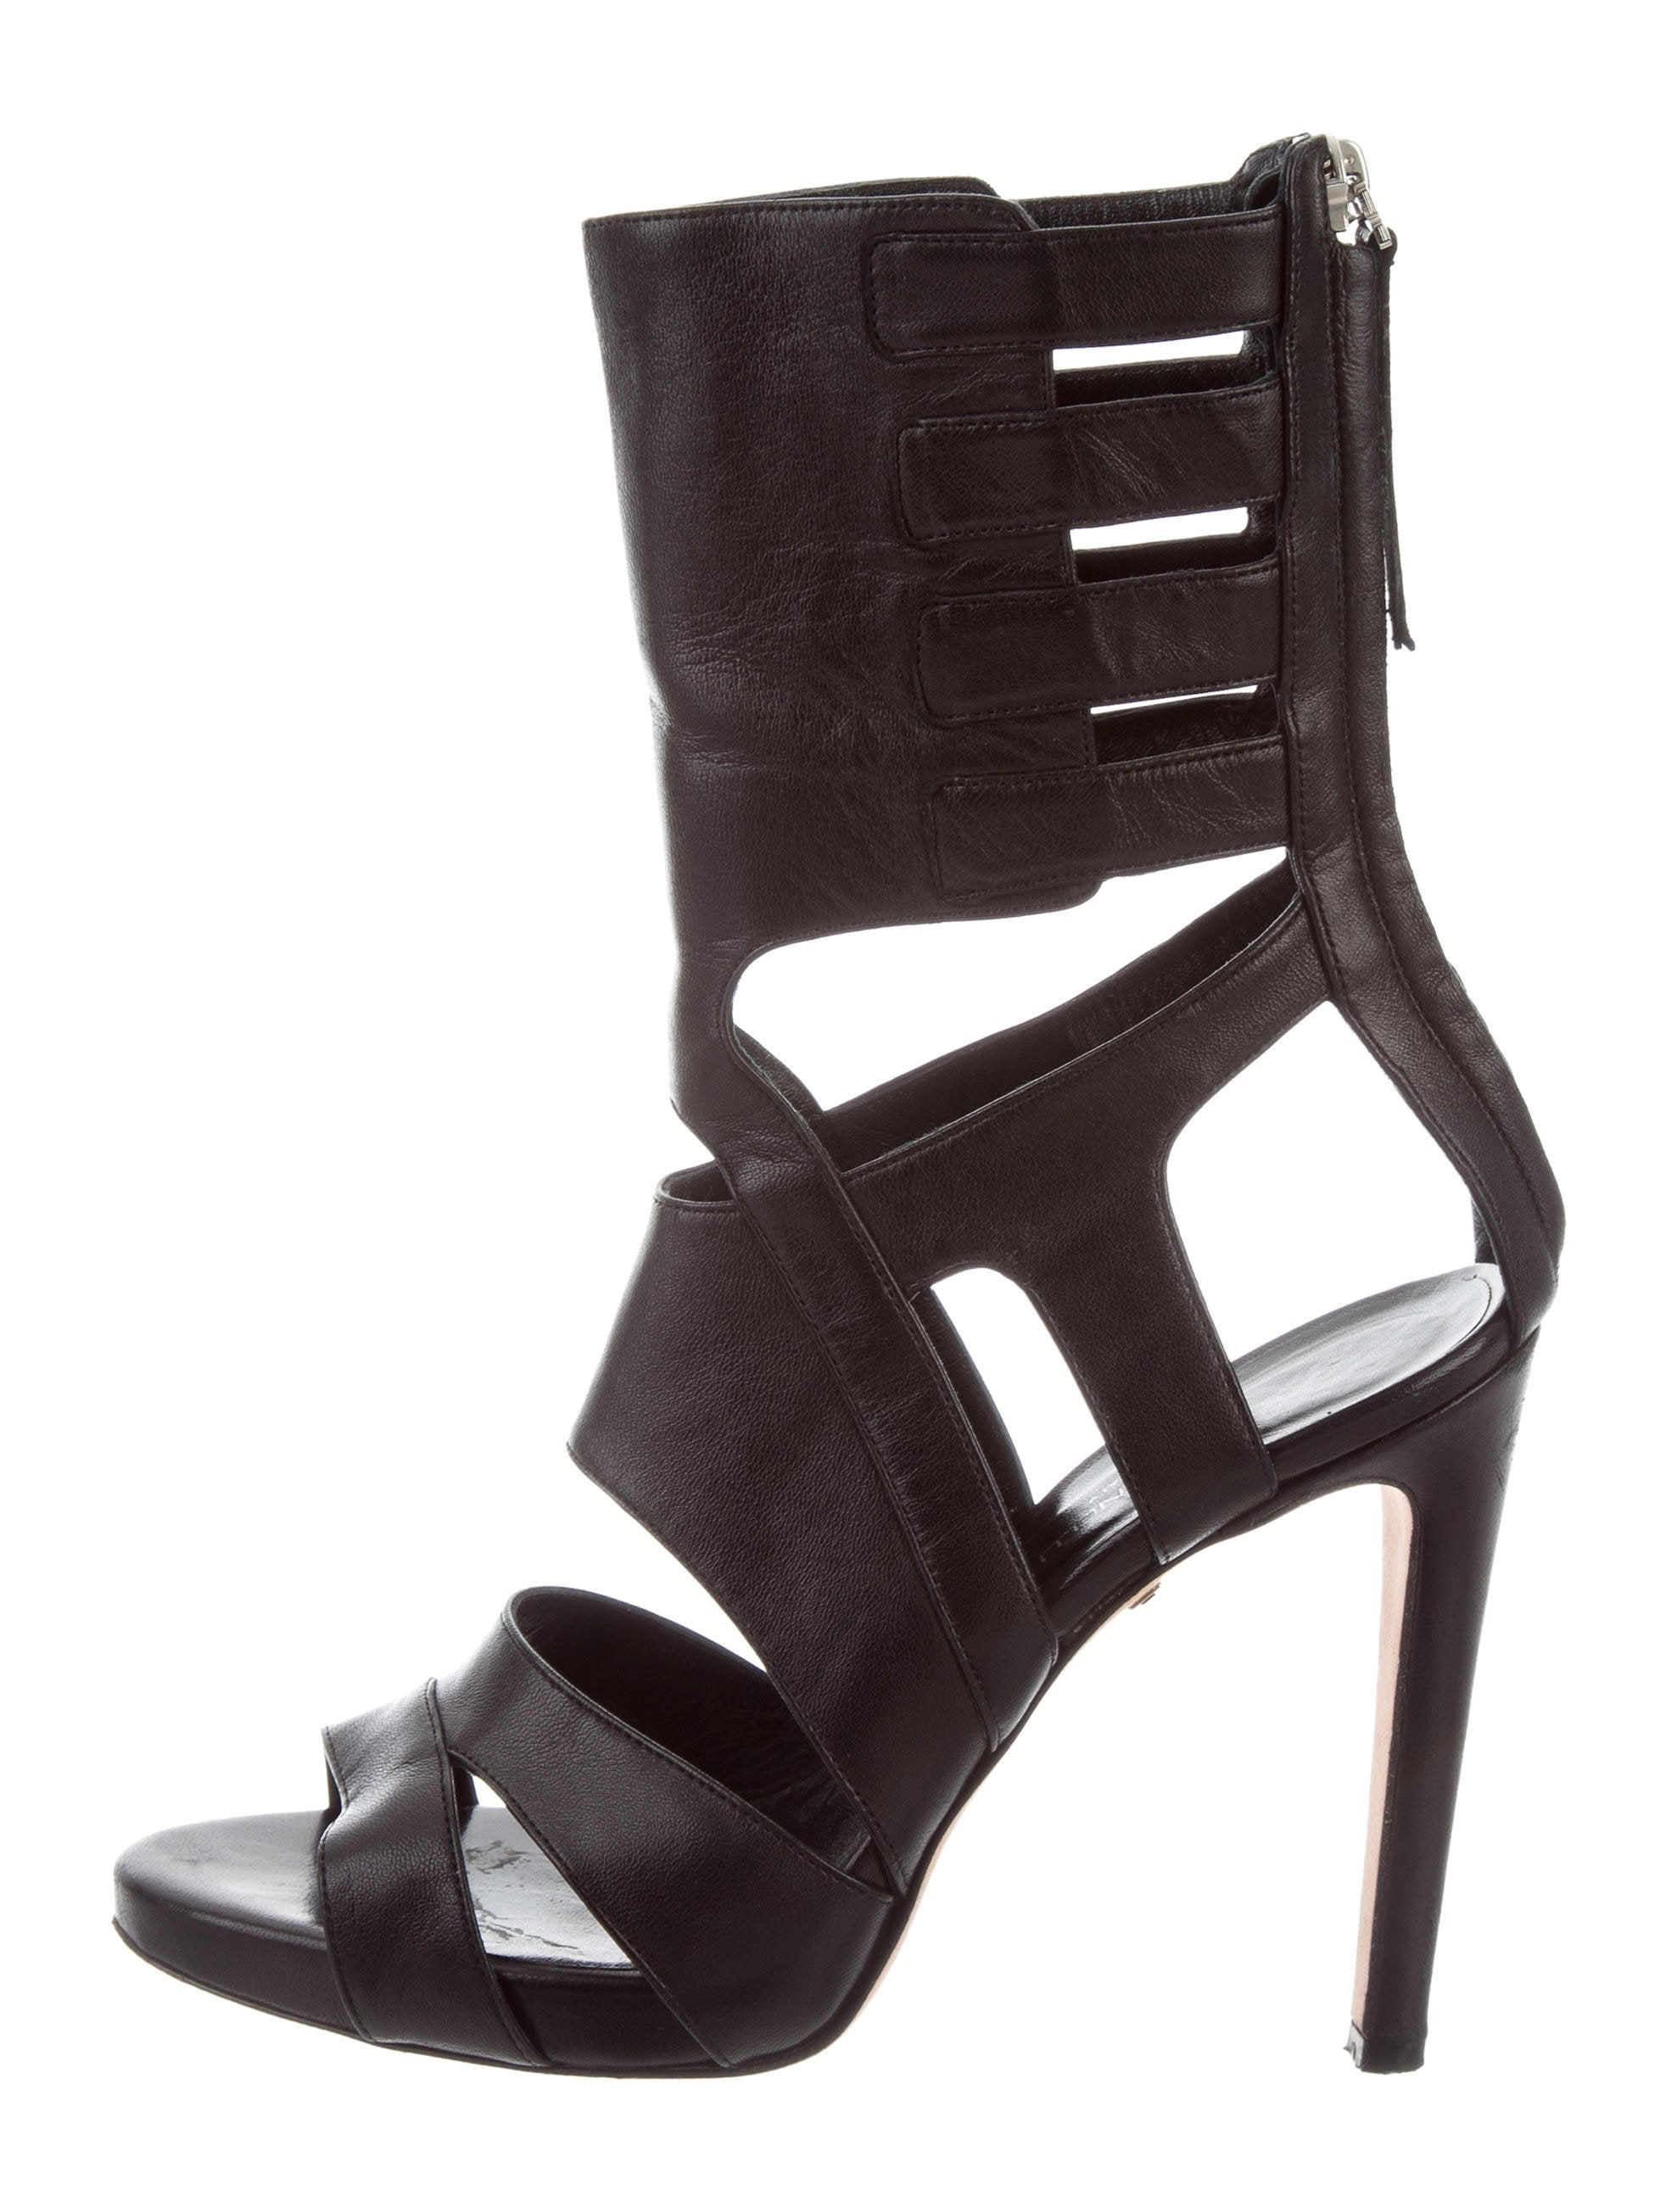 Tania Spinelli Leather Caged Sandals outlet discount c4UJGgLS